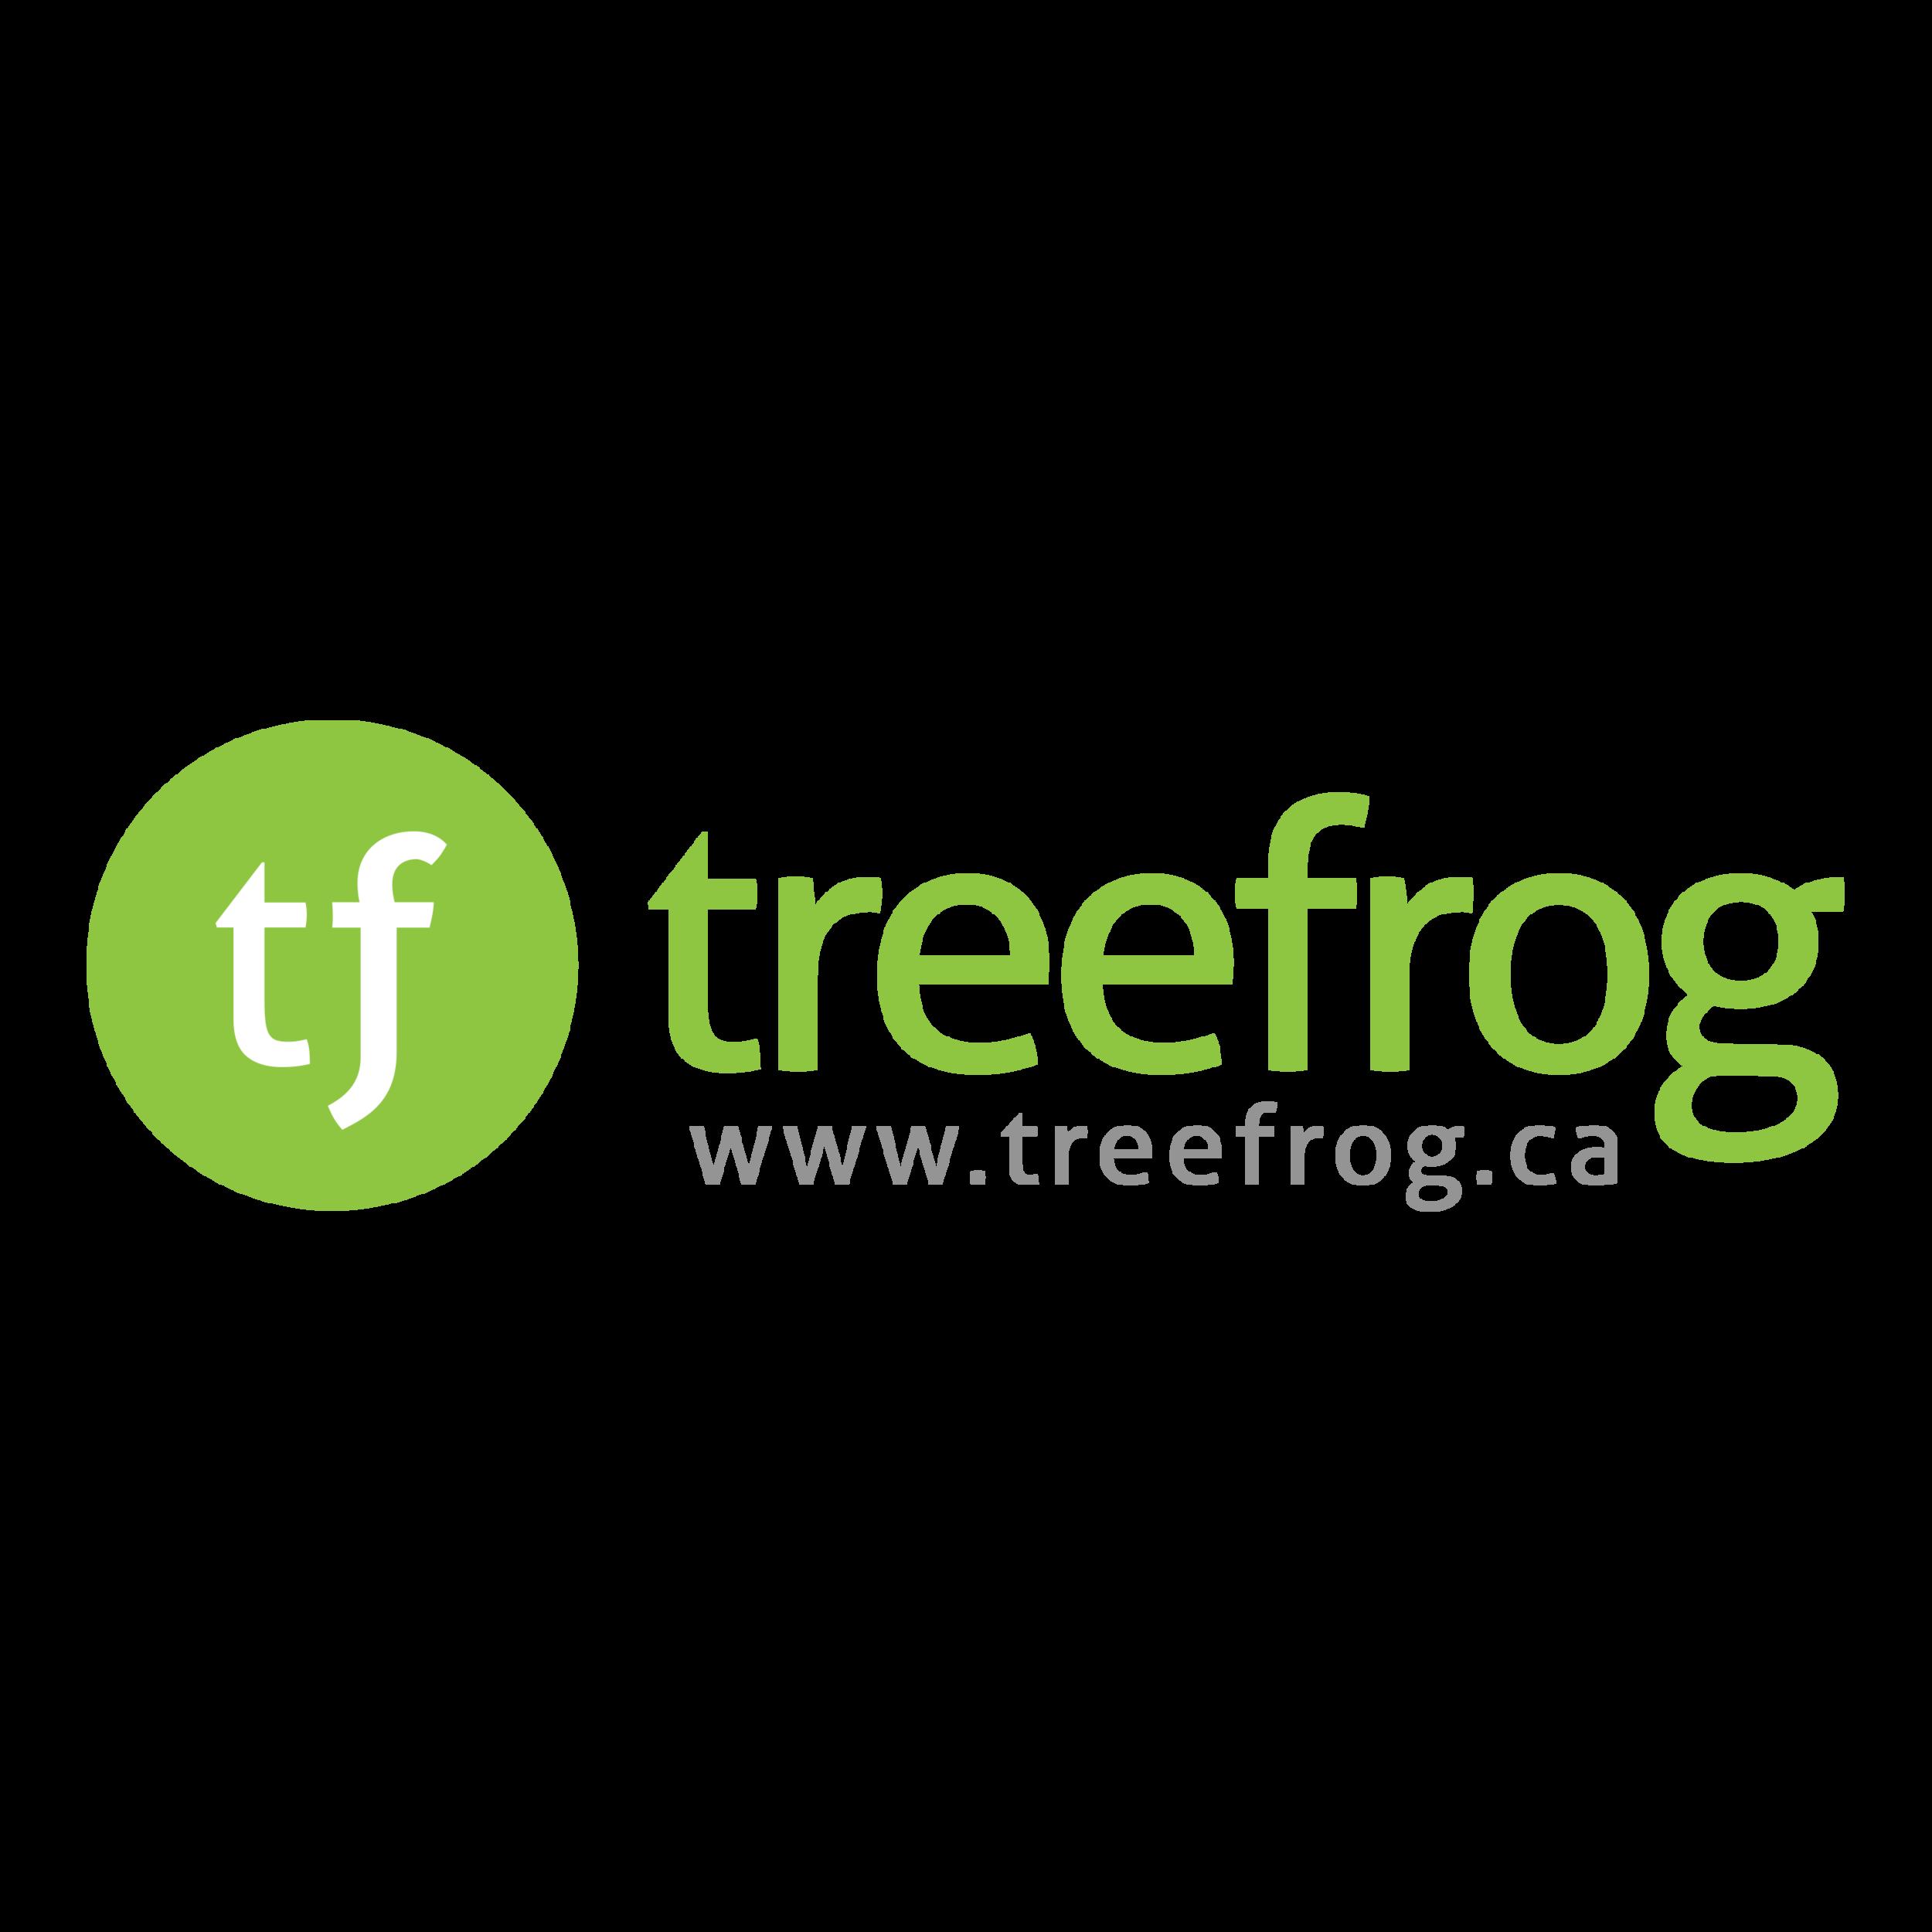 Treefrog-logo-full-colour.png